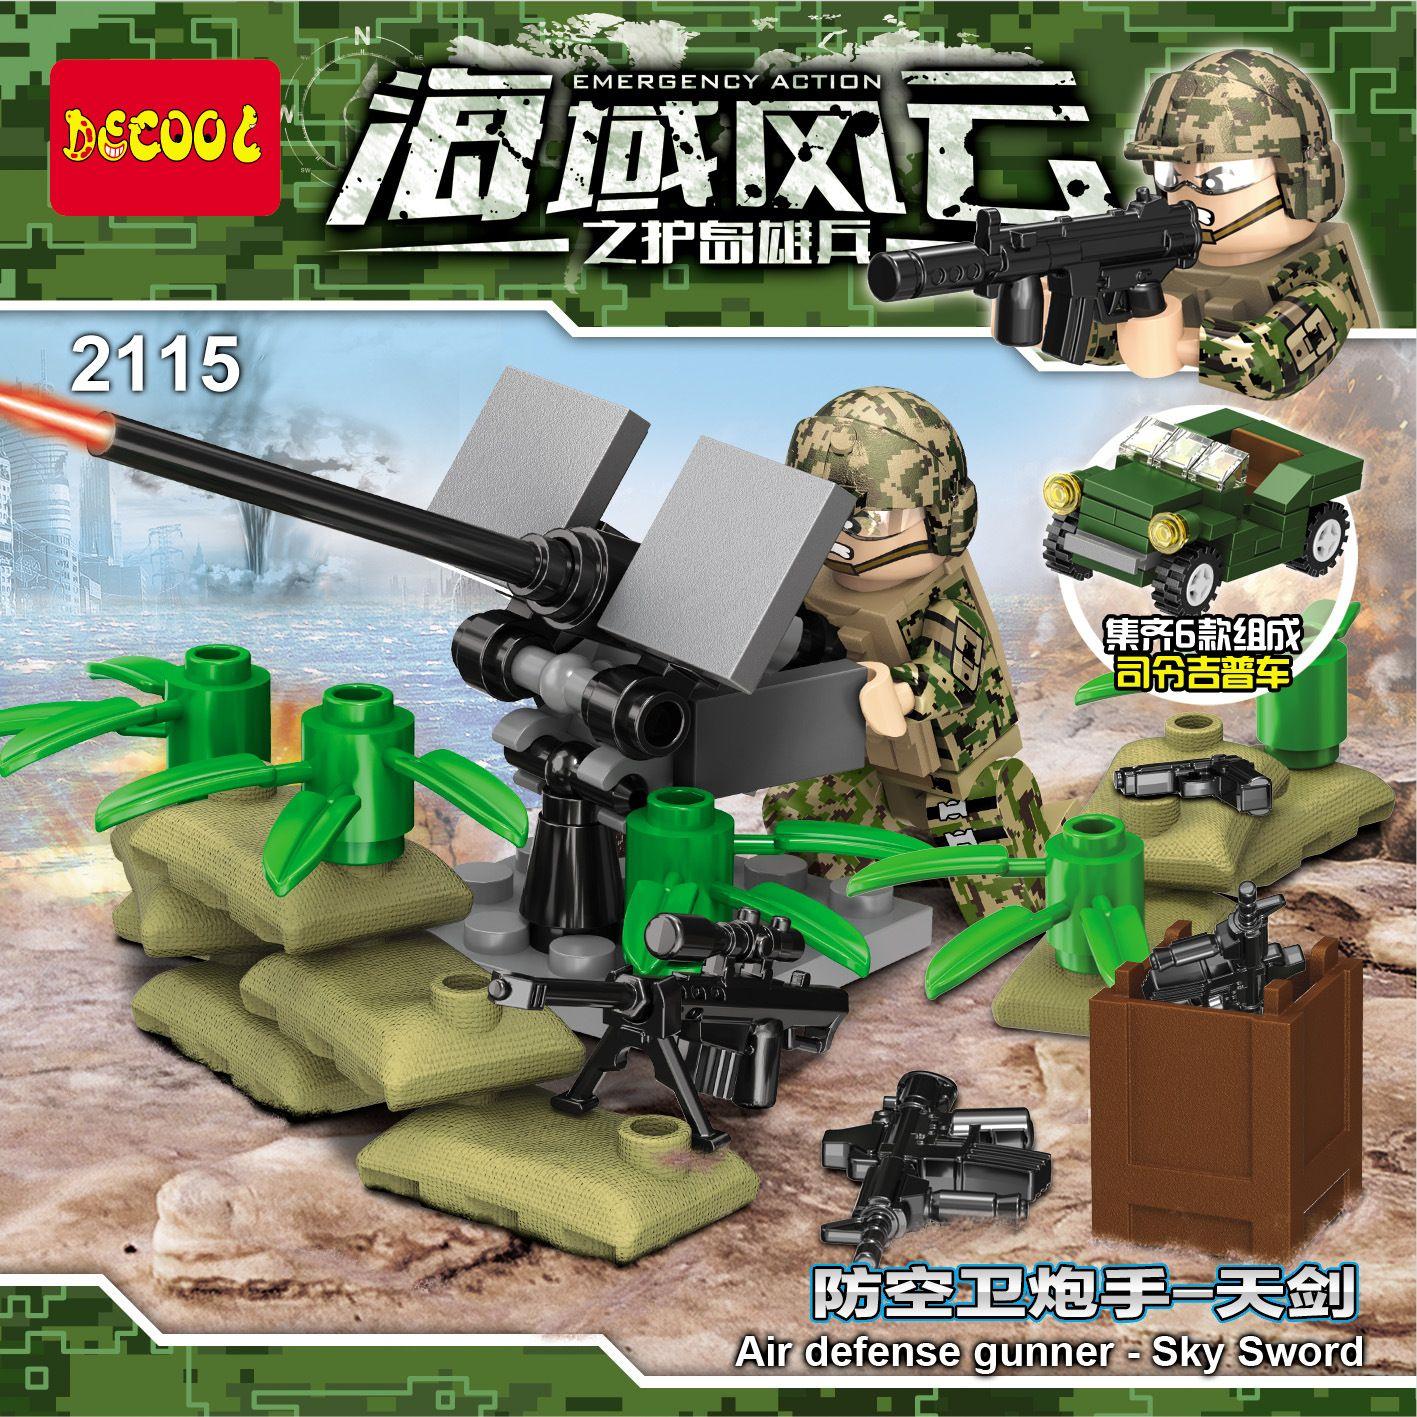 BEST Sale Gift  DECOOL / Jisi 2115 Emergency Action Air defense gunner Sky Sword  #1193, #2017, #2115, #6, #BootlegBricks, #Bricks, #CheapBricks, #DECOOLJisi, #DECOOLJisi2115EmergencyActionAirDefenseGunnerSkySword, #DECOOLJisi2115, #KnockOffLego, #LegoClone, #LegoFake, #None #bricks #lepin #sale #toys #knockoffbrick #kobricks #brickset #lego